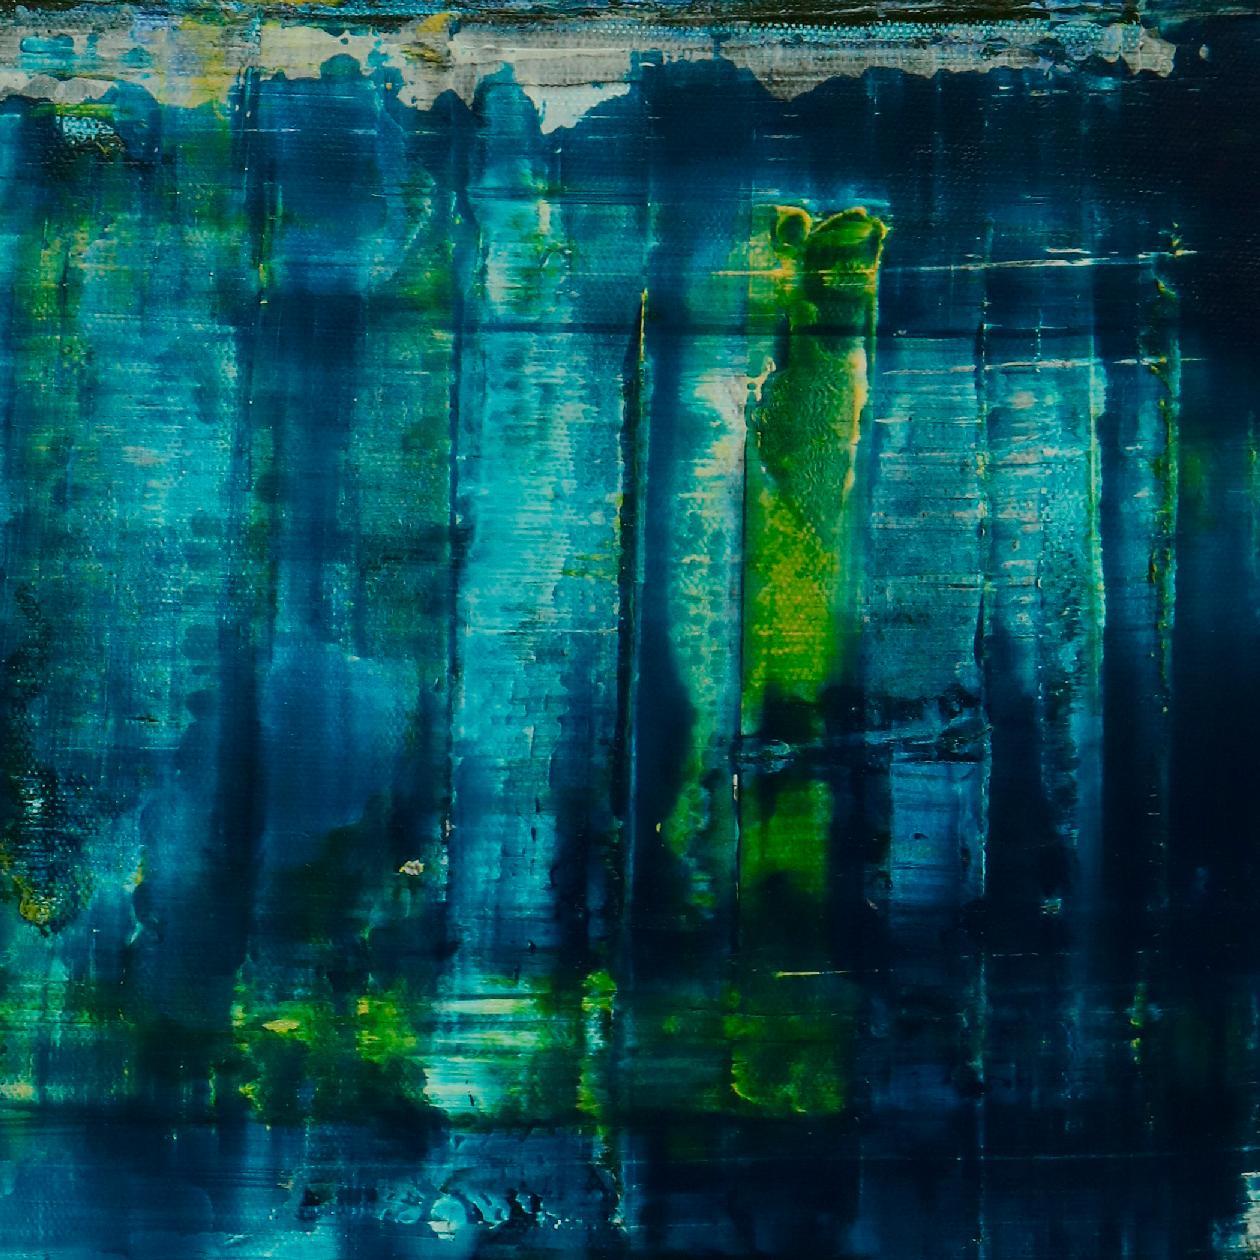 DETAIL - Emerald Forest Spectra 1 by Nestor Toro